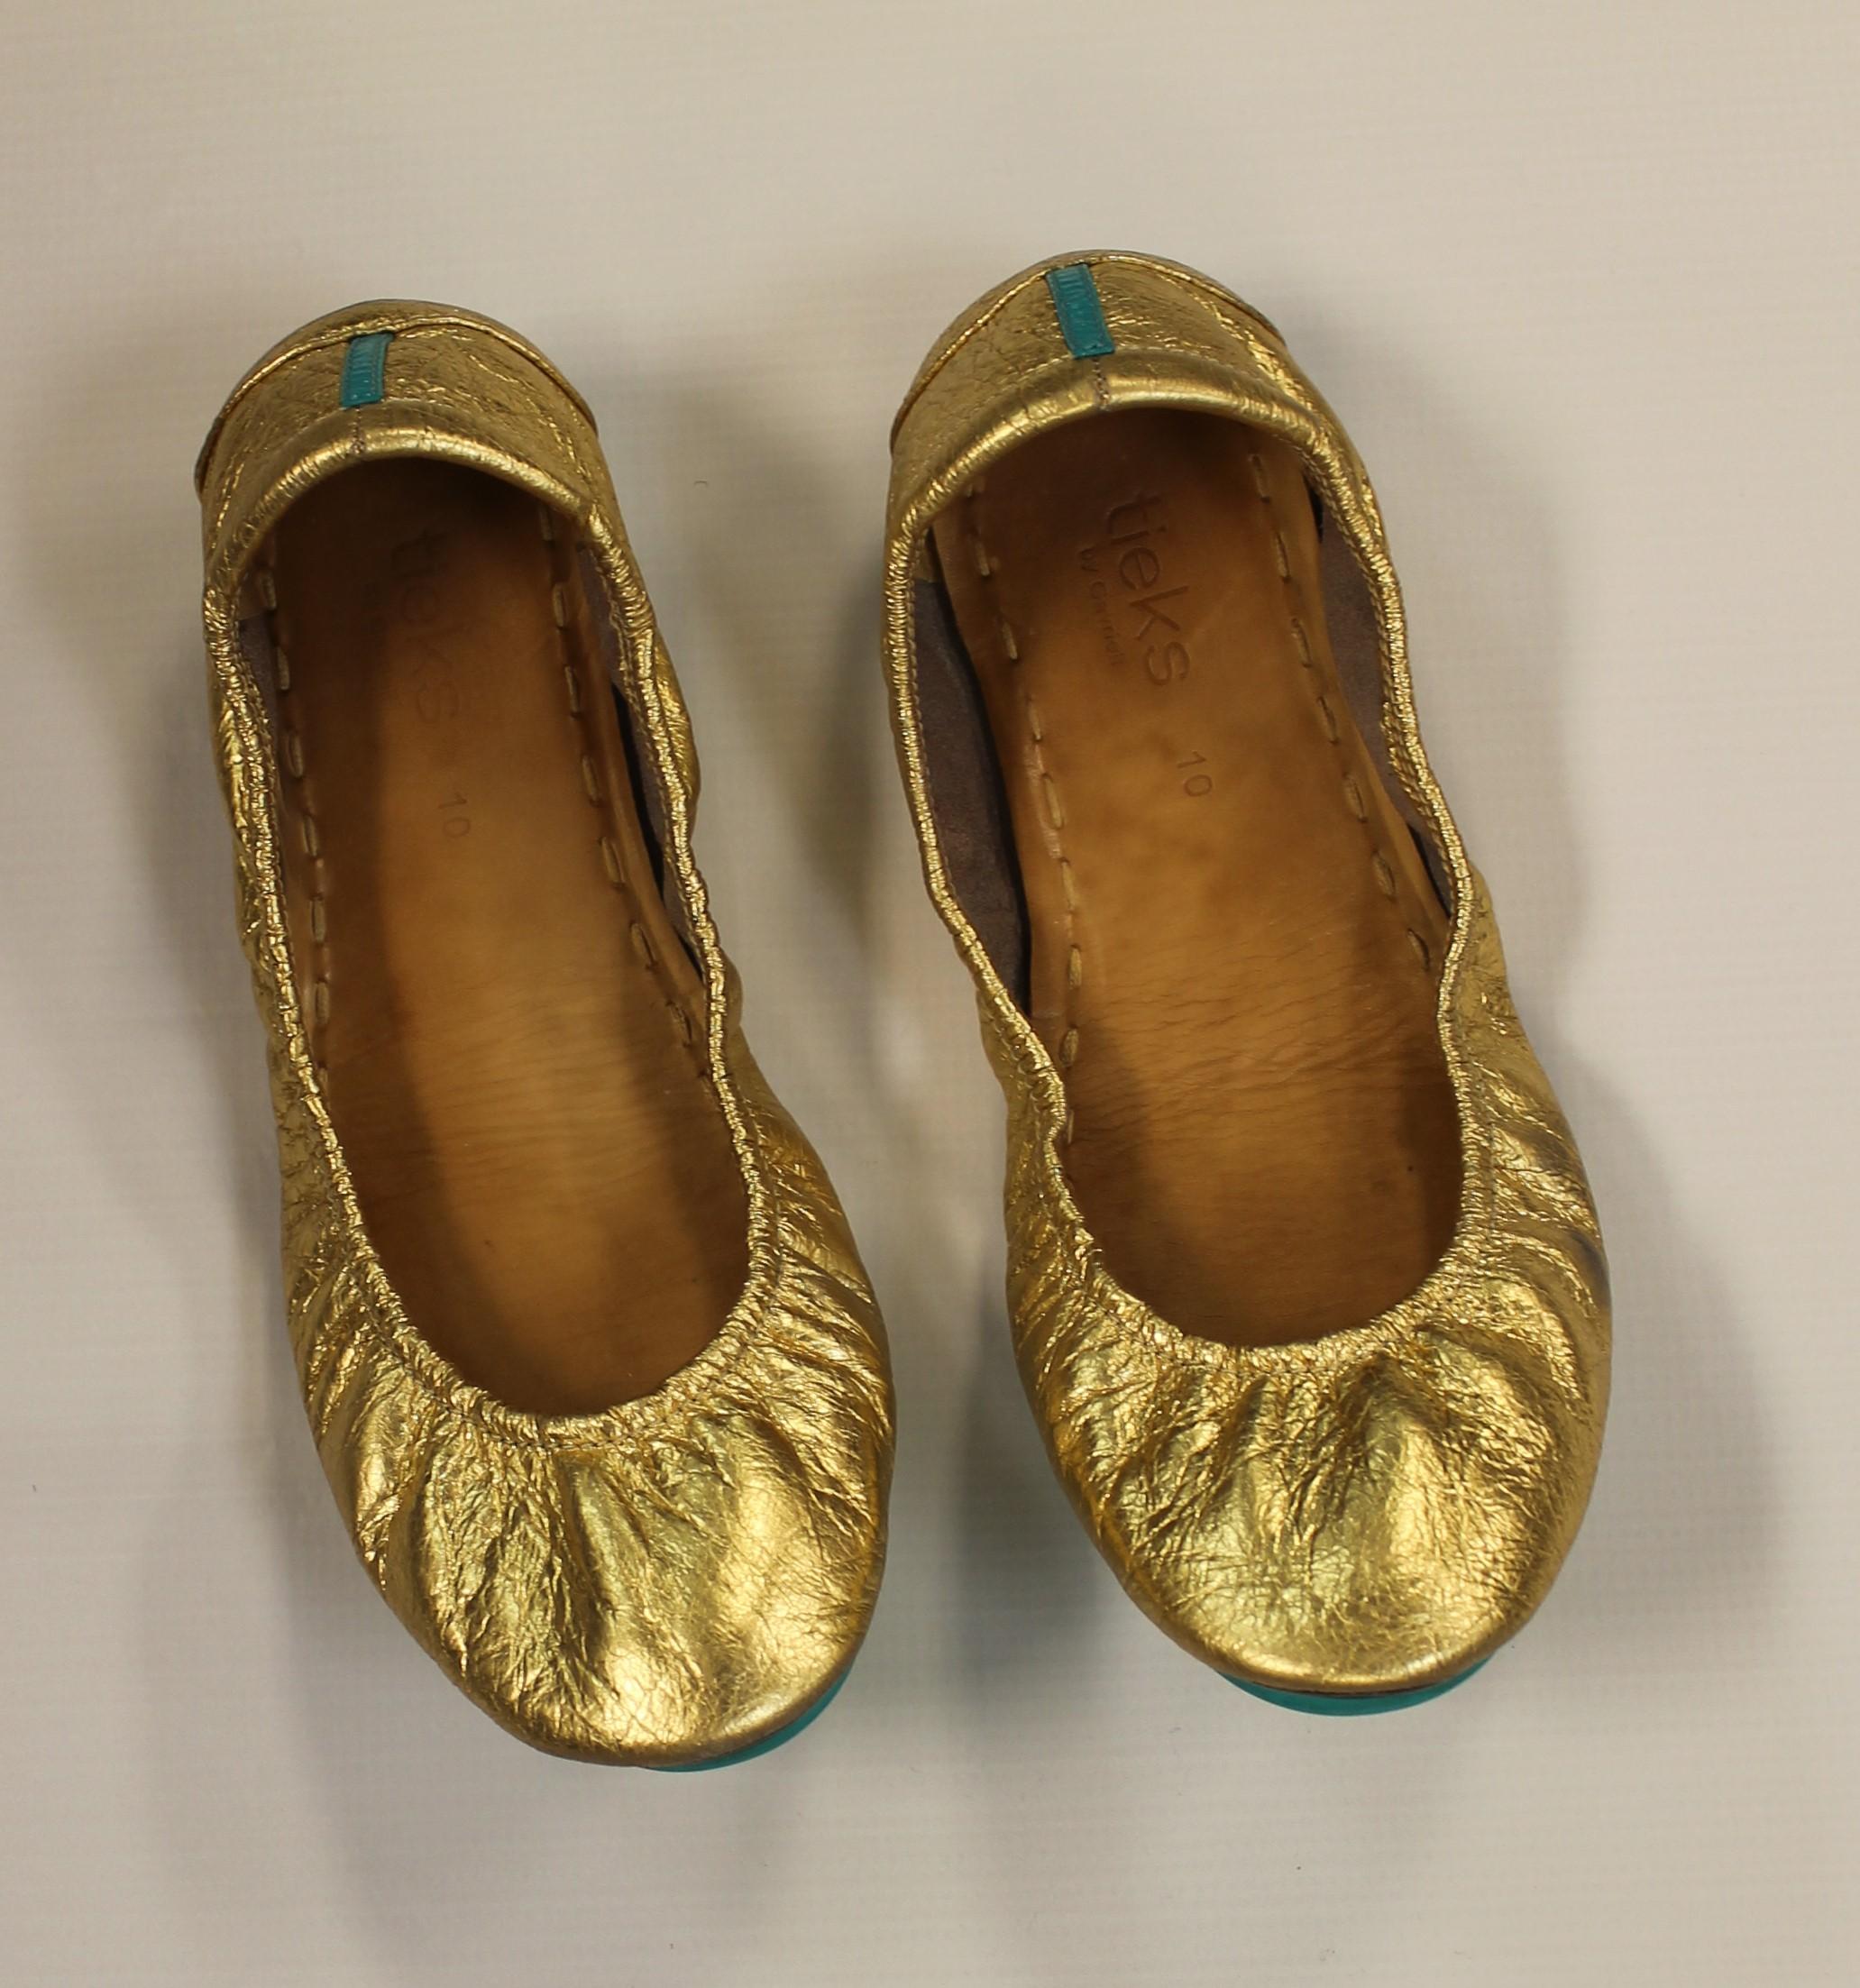 TIEKS-10-Gold-Leather-Solid-Flats_63886A.jpg